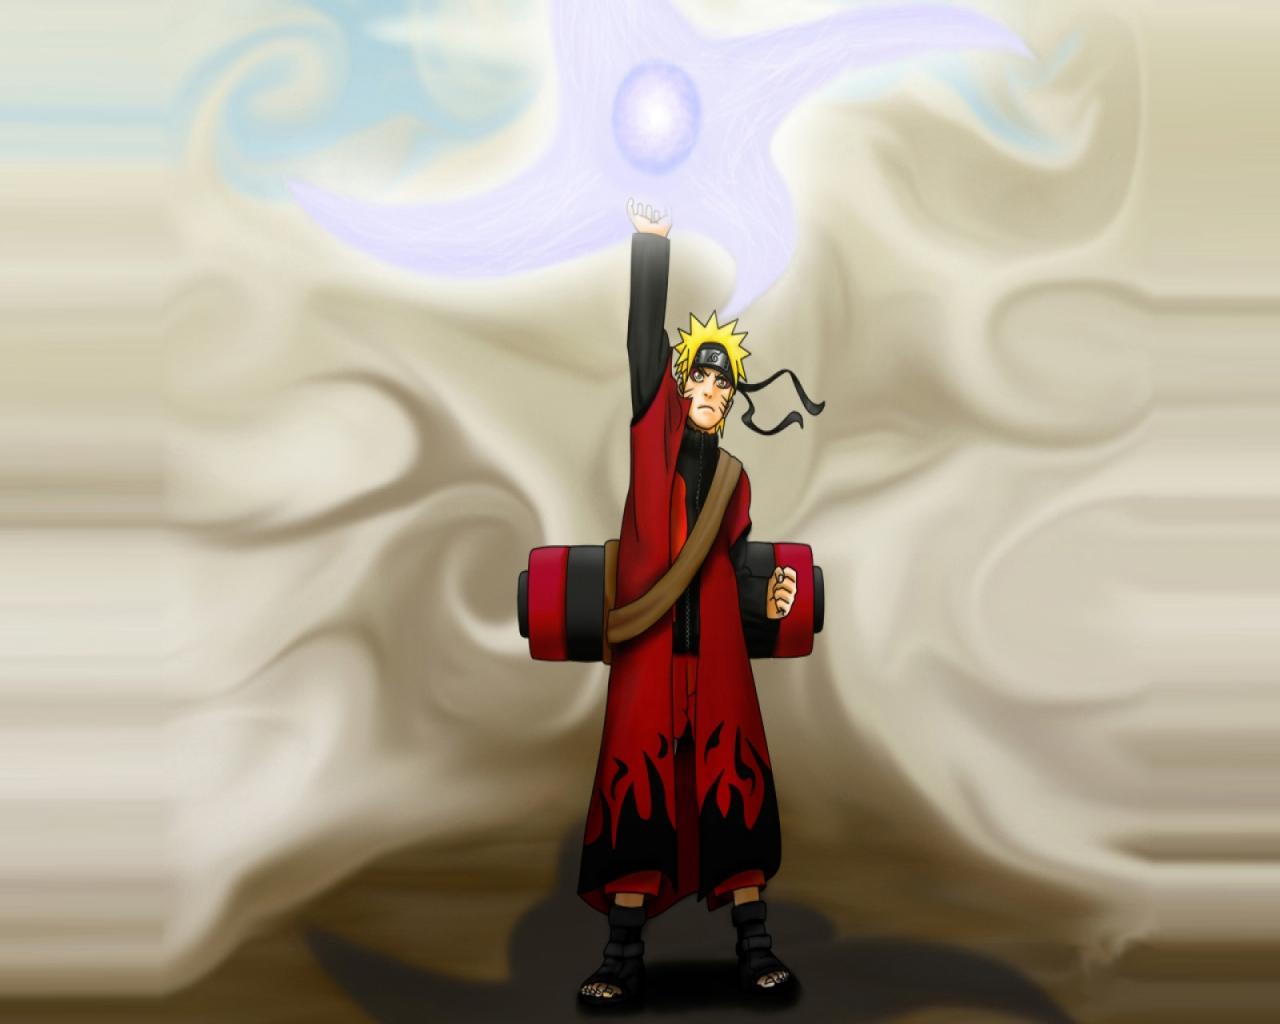 Bp Blogspot Com Czxyfeoum Tsvdpgl_i Naruto Shippuden Wallpaper Naruto Sage Mode